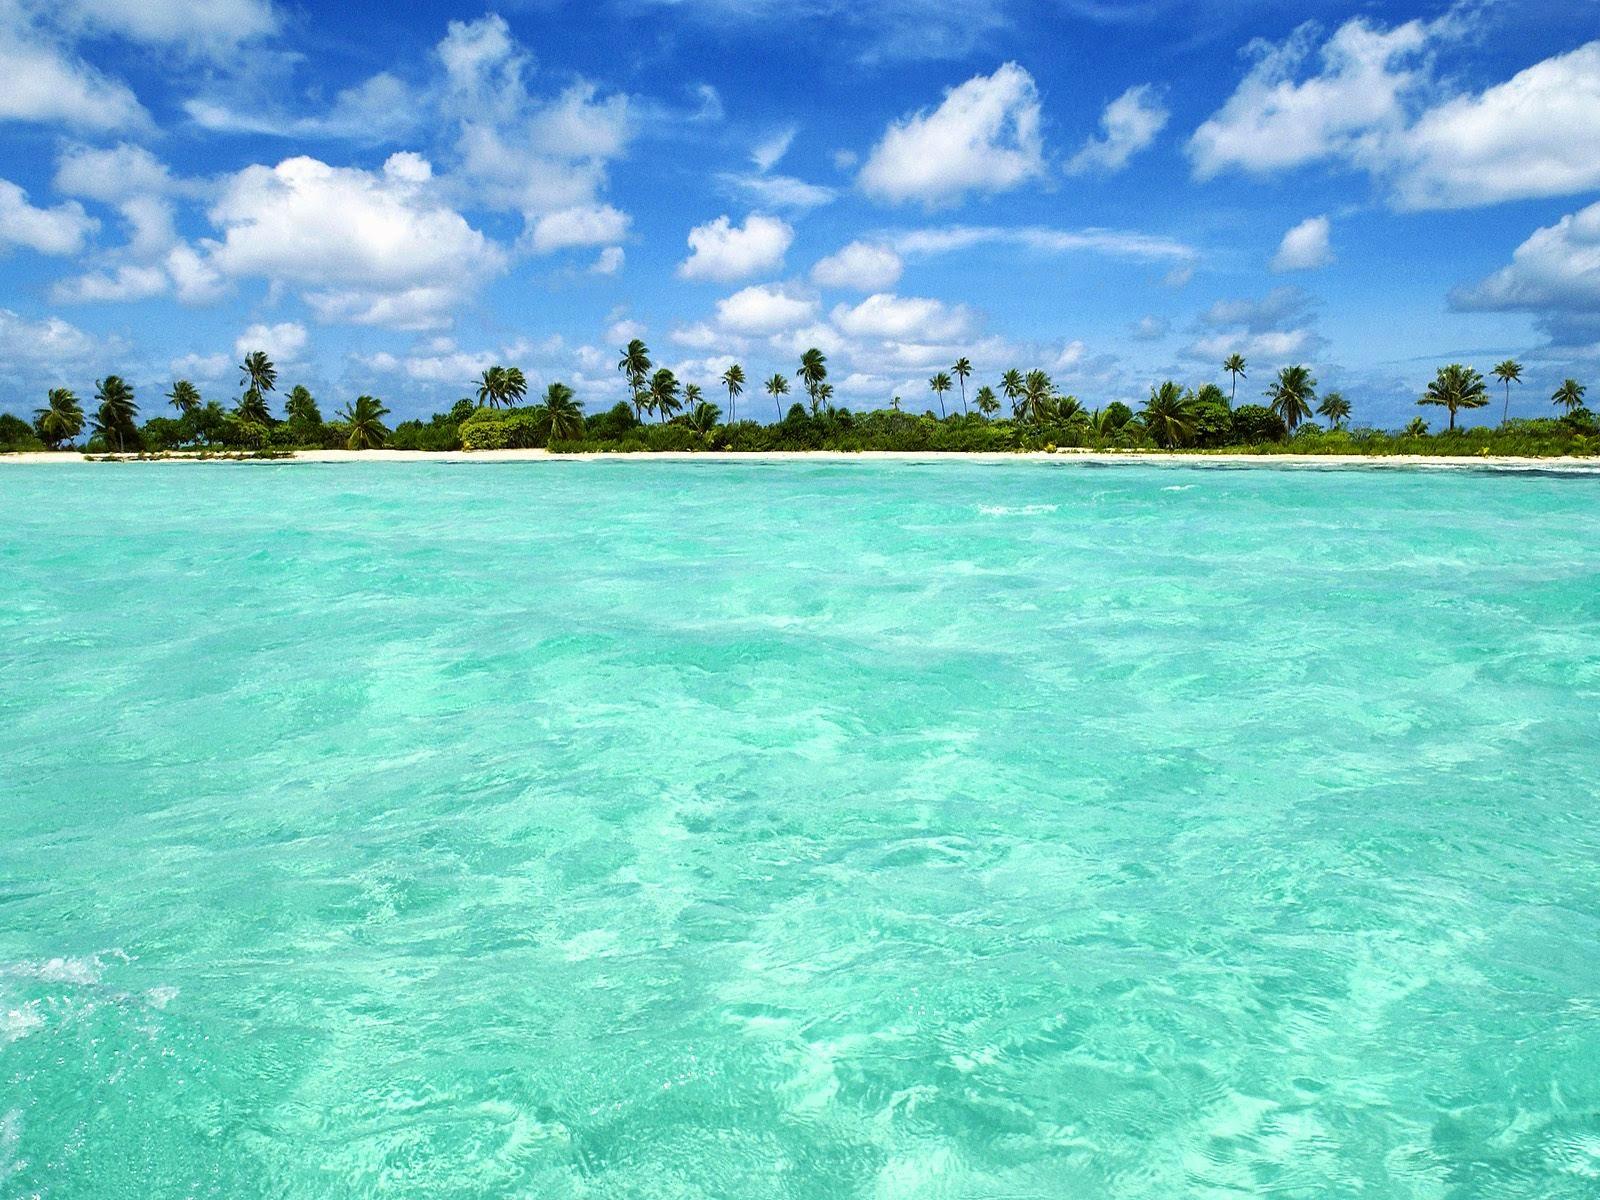 beautiful beach picture Download Tropical Island Beach Scenery Clean 1600x1200